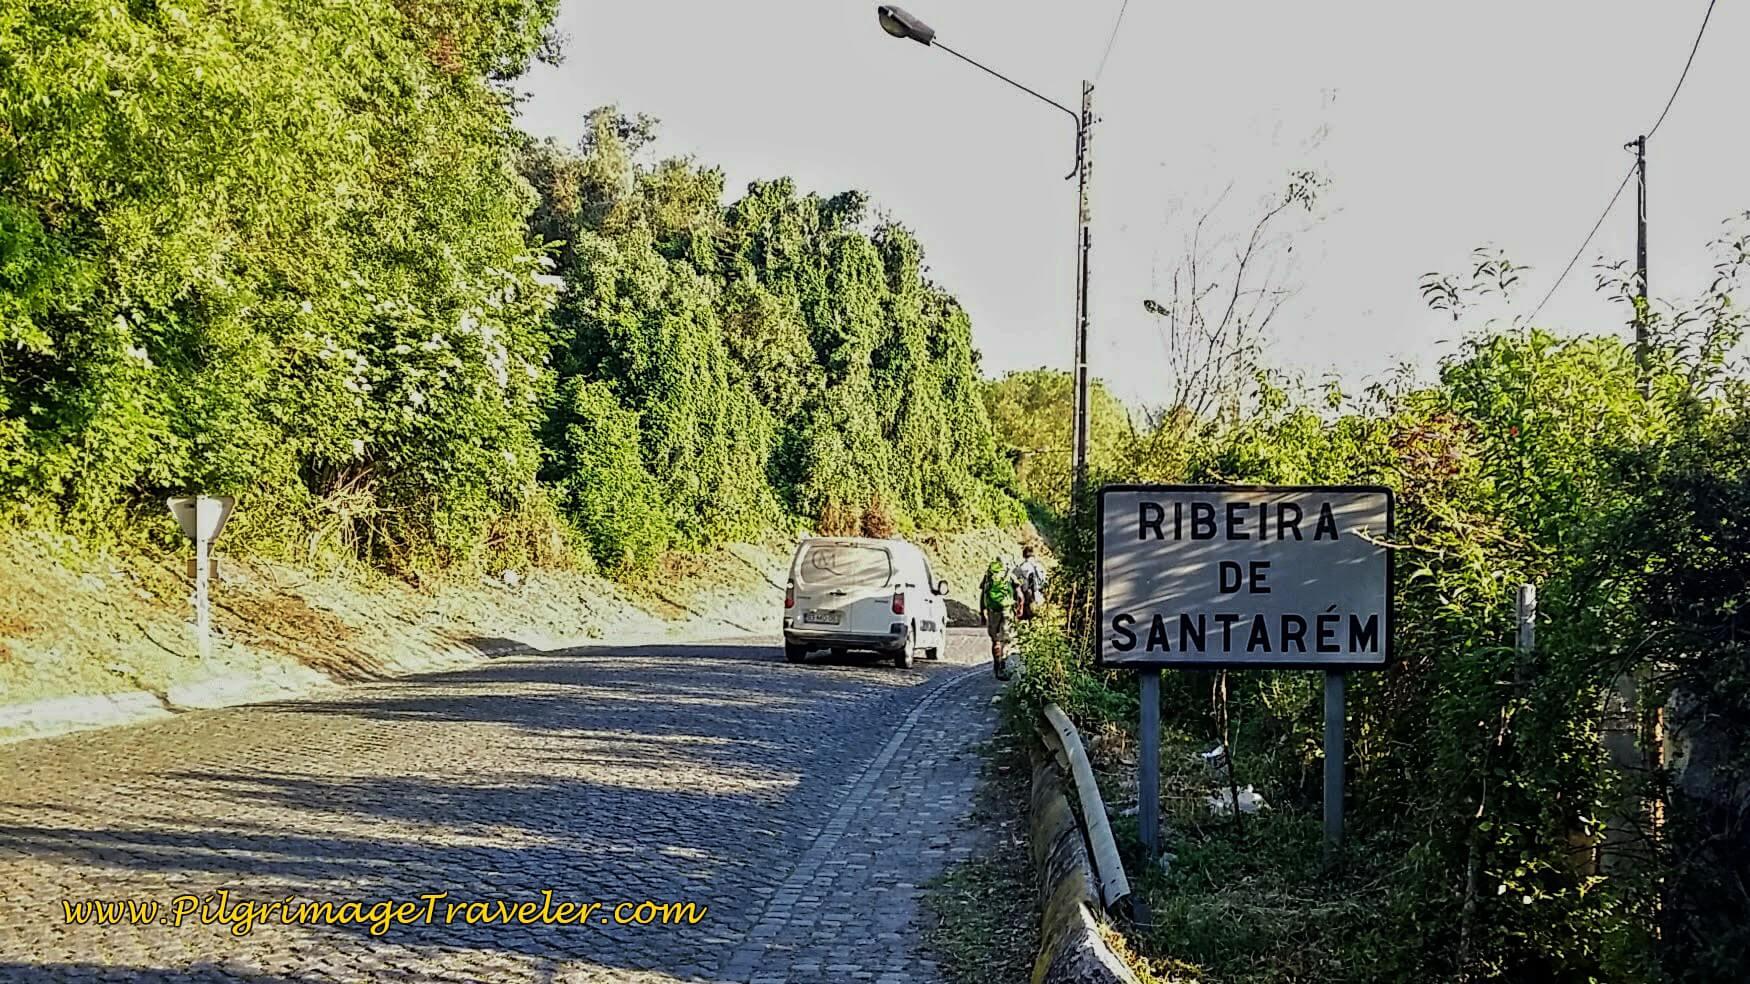 Walking the N365 into Ribeira de Santarém on the Portuguese Way.